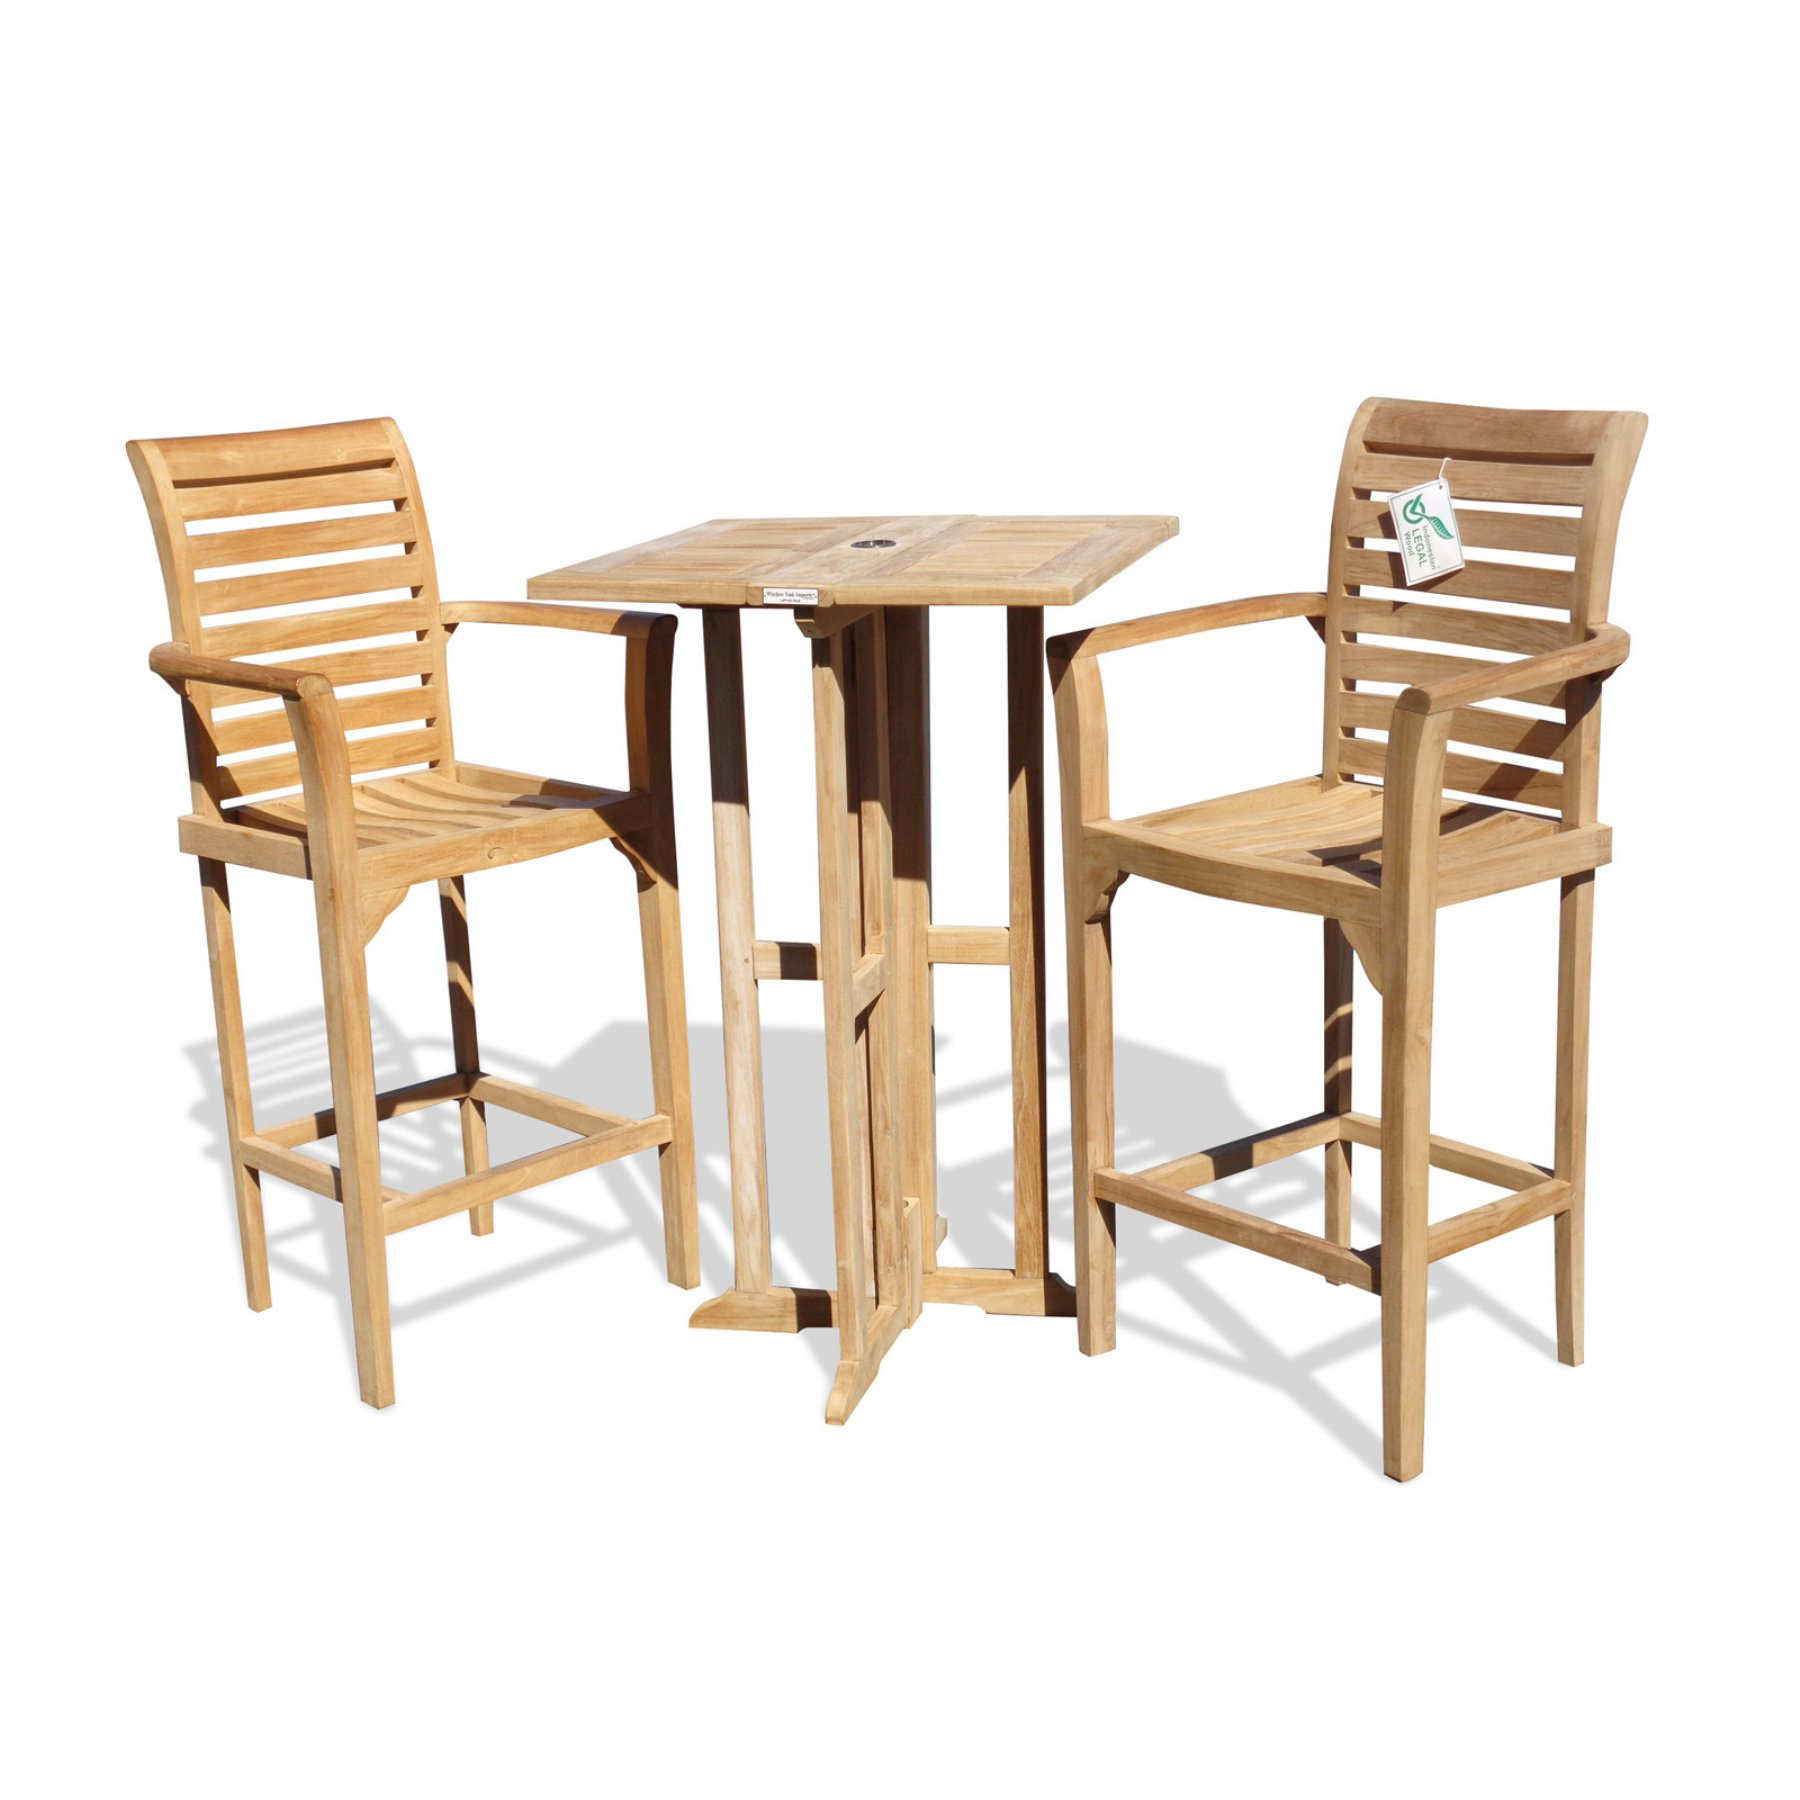 Outdoor Windsor Teak Furniture Bimini Counter Height Teak 3 Piece